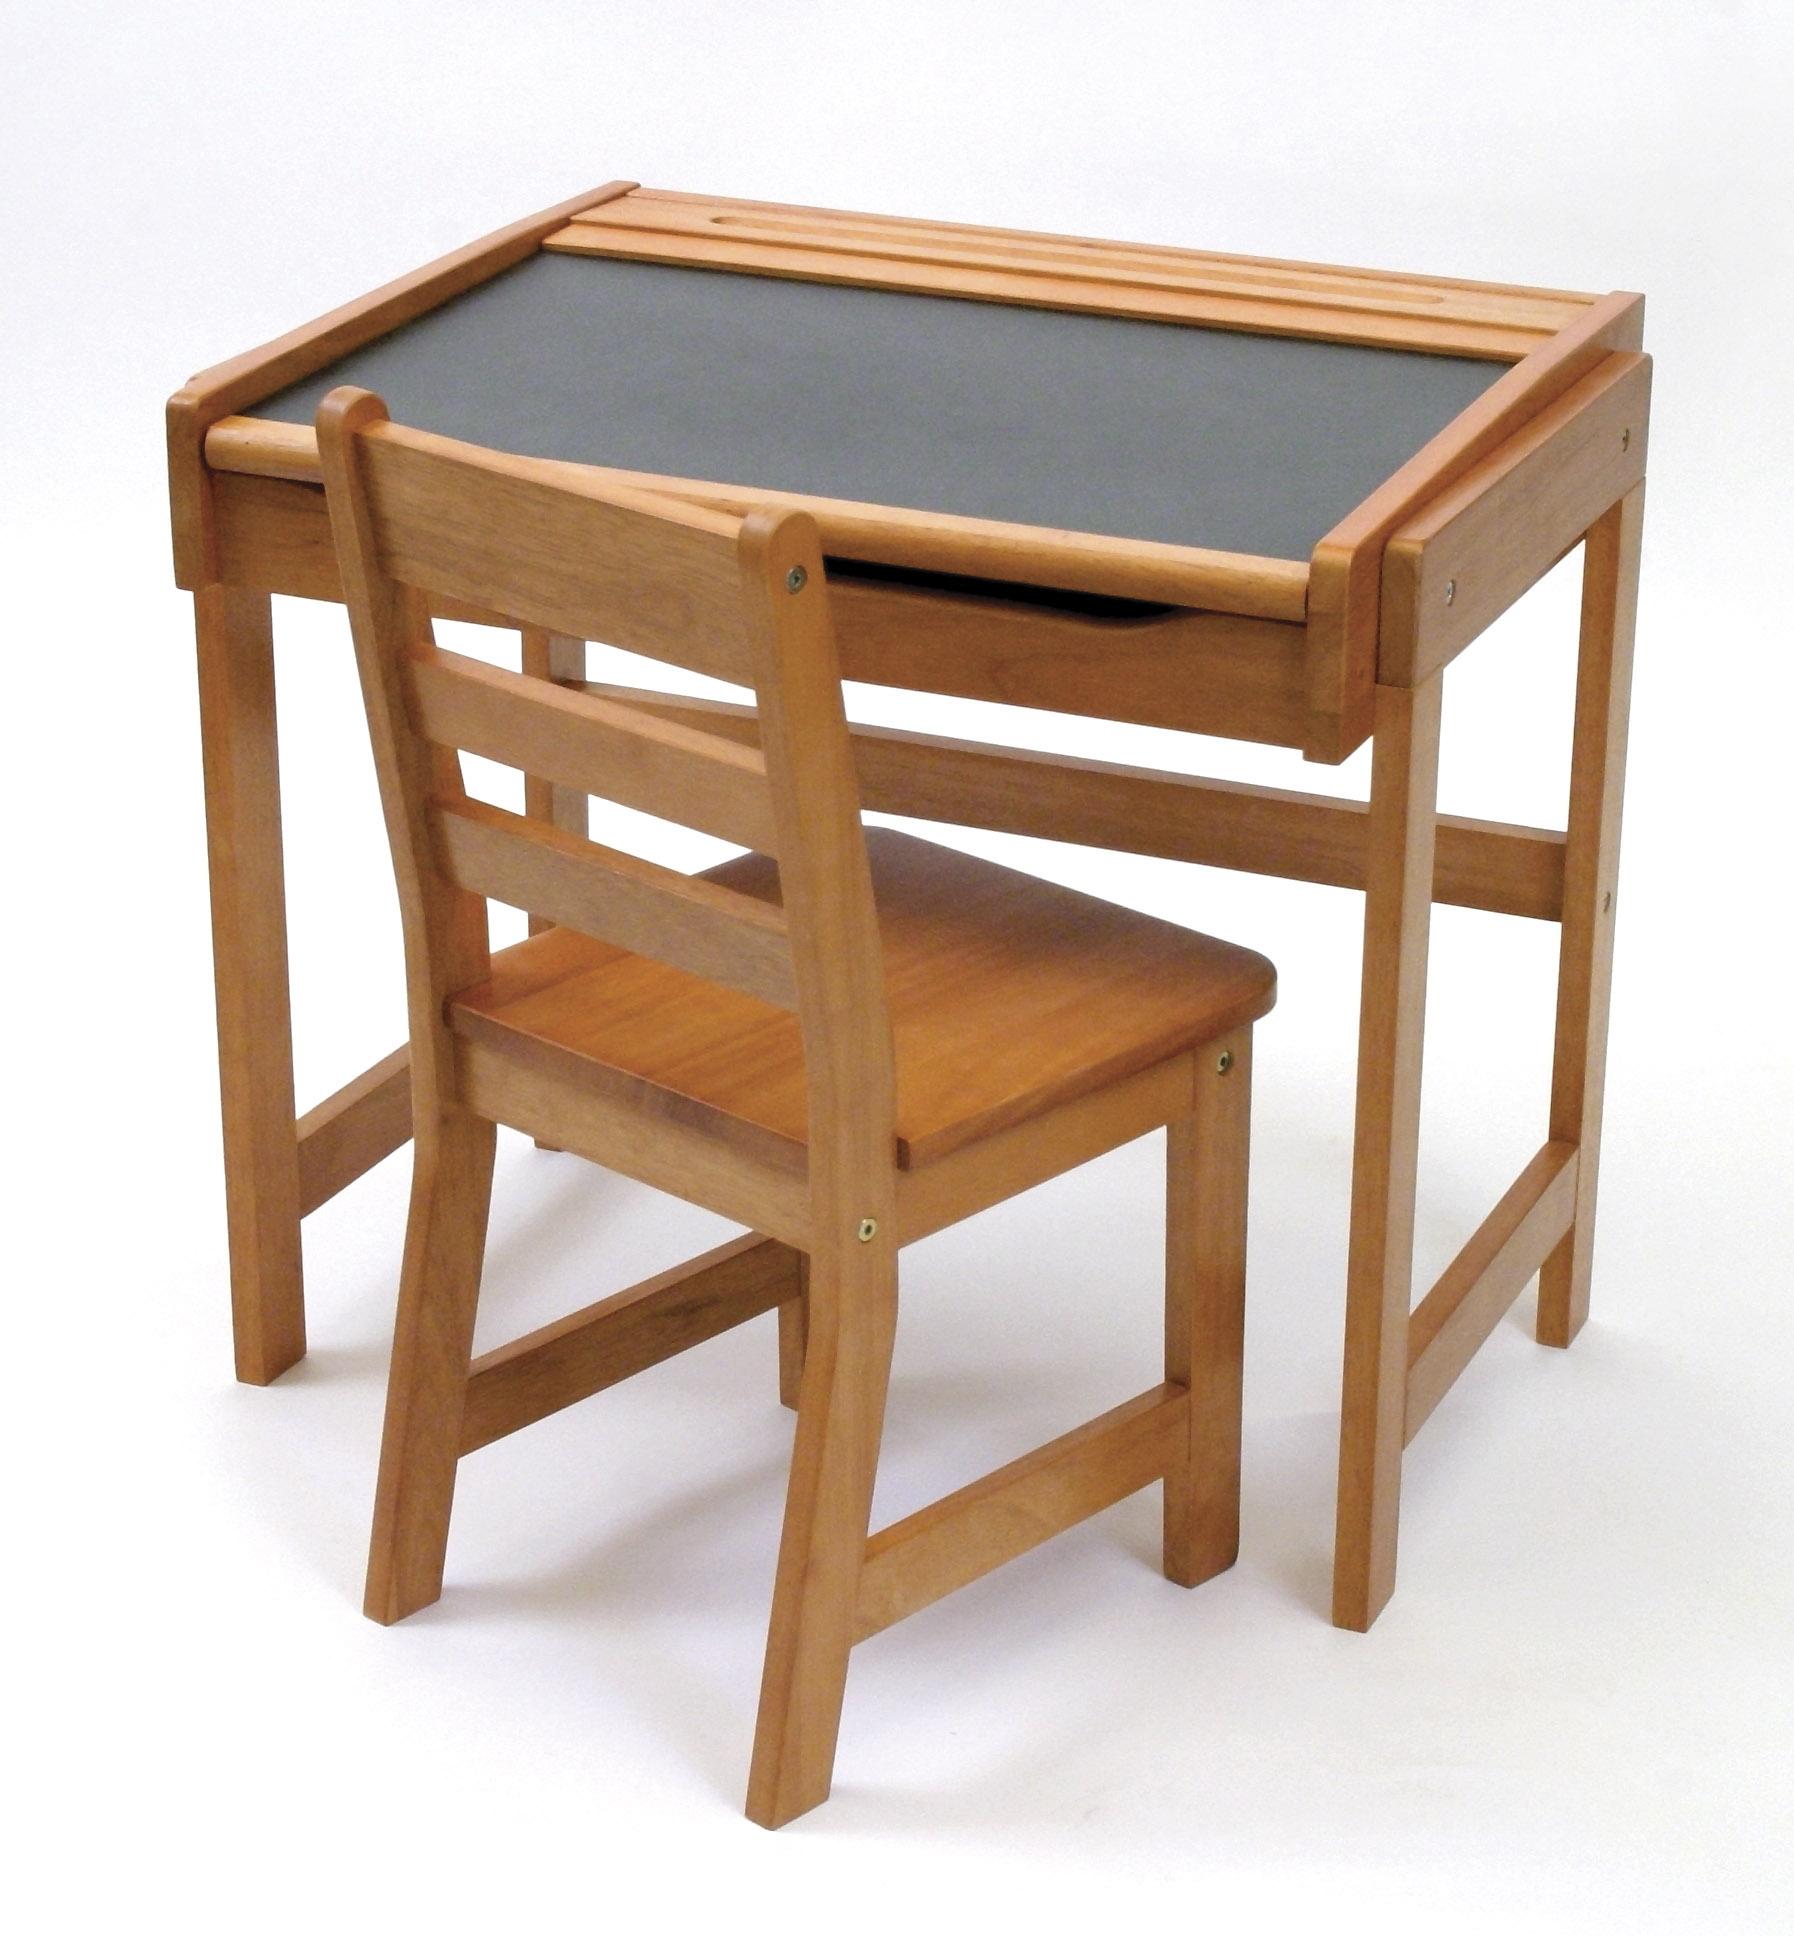 Cheap Desk And Chair Set - Decor Ideas